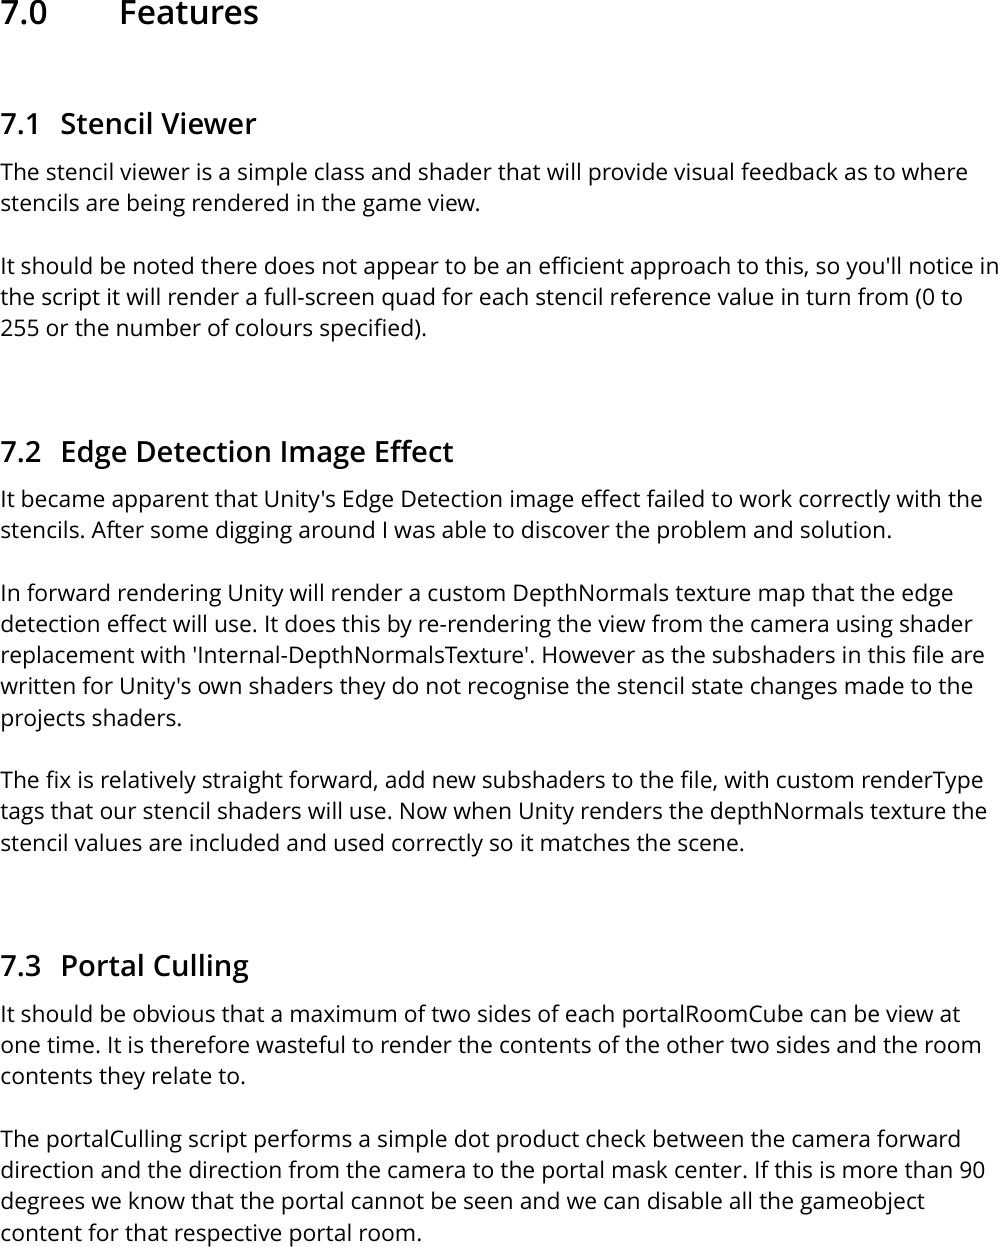 Portal Room Cube Guide